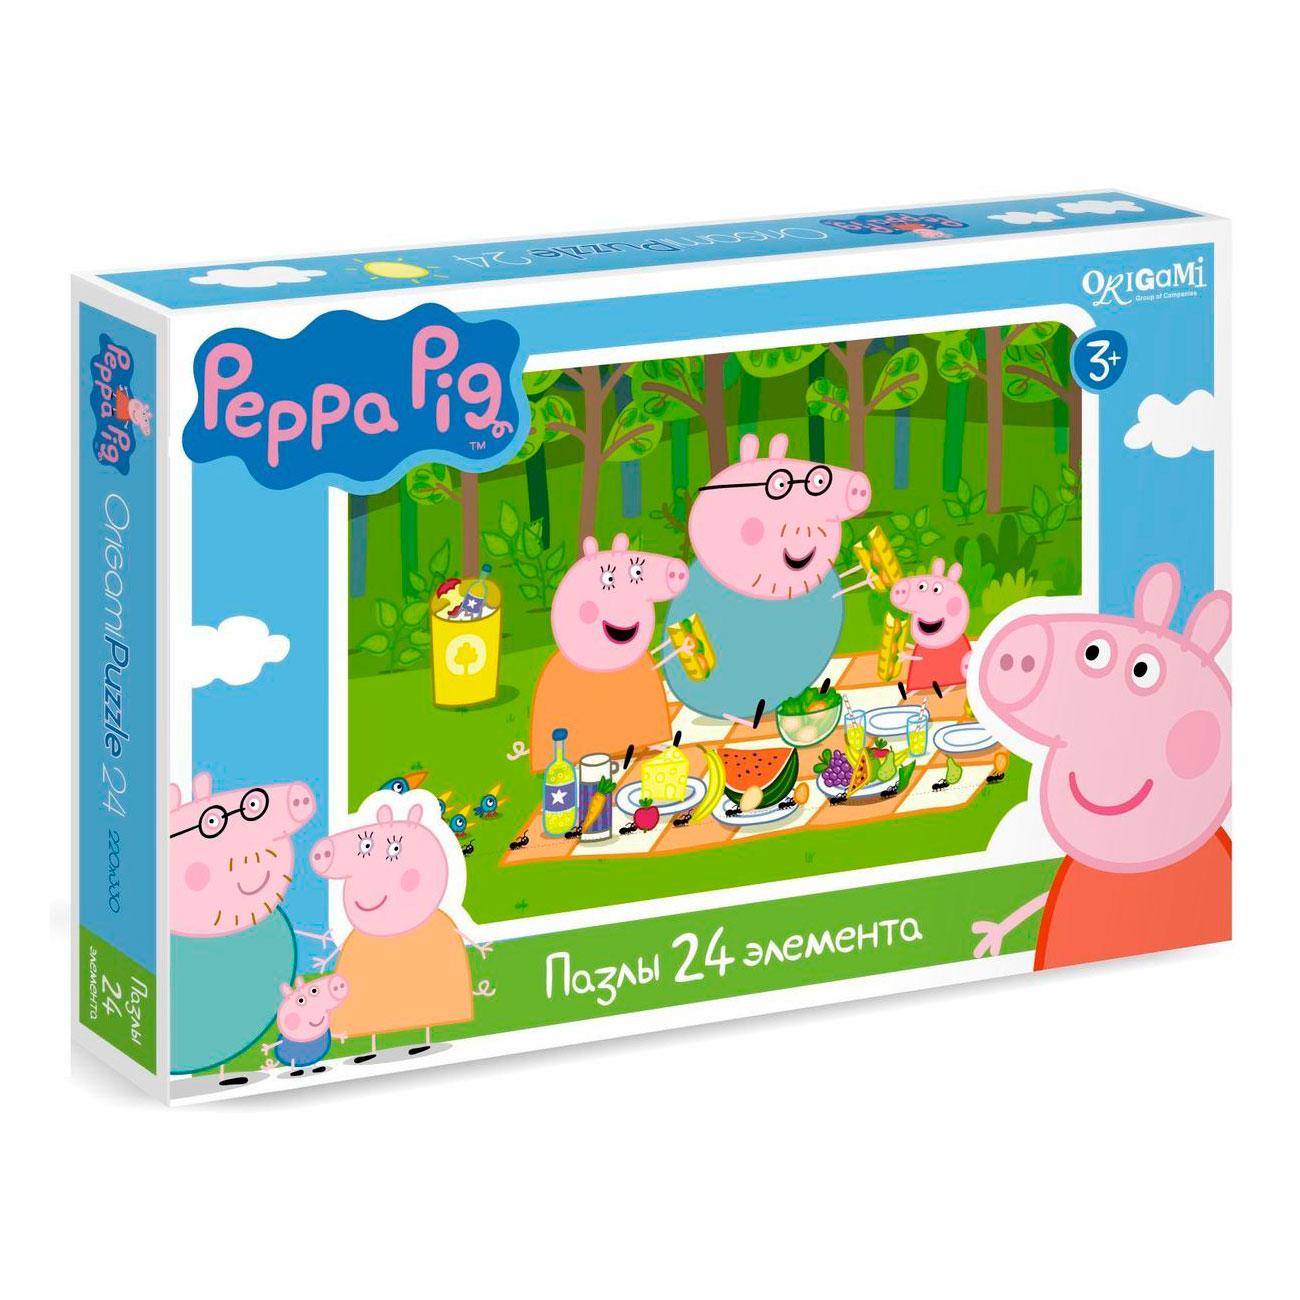 Пазл Origami Peppa Pig 1571<br>